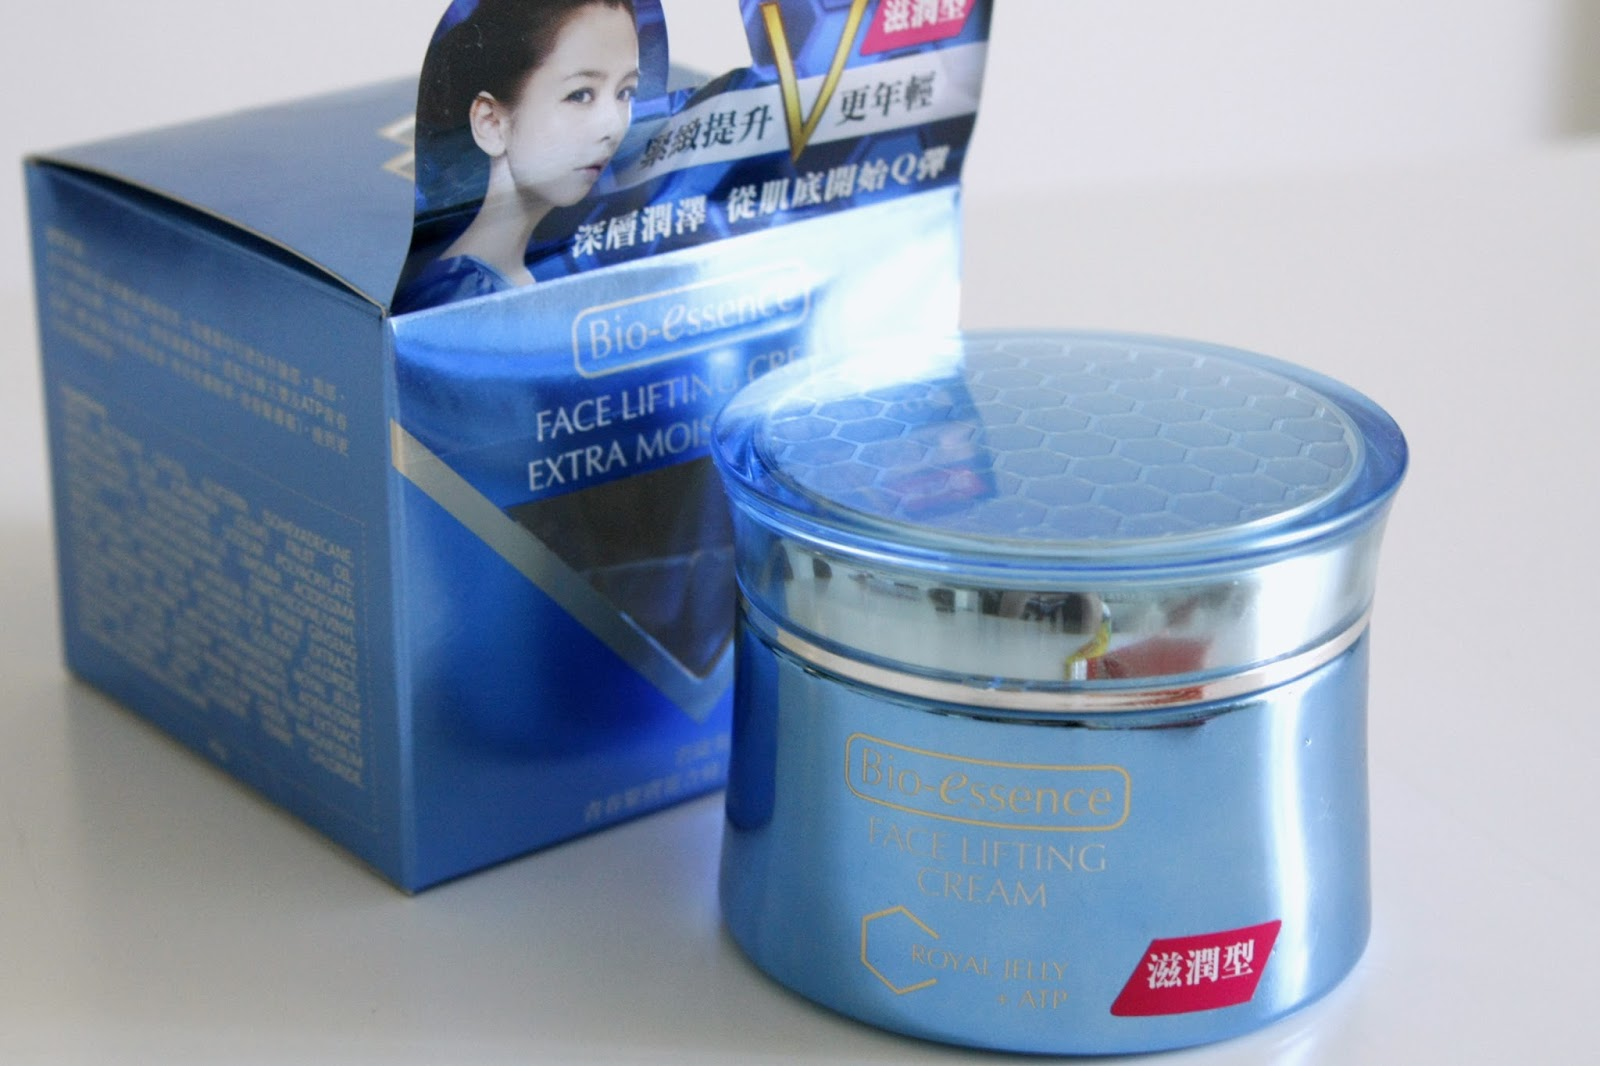 Firma Kokarda Make Up Studio Bio Essence Face Lifting Cream Royal 40gr Nowa Wersja